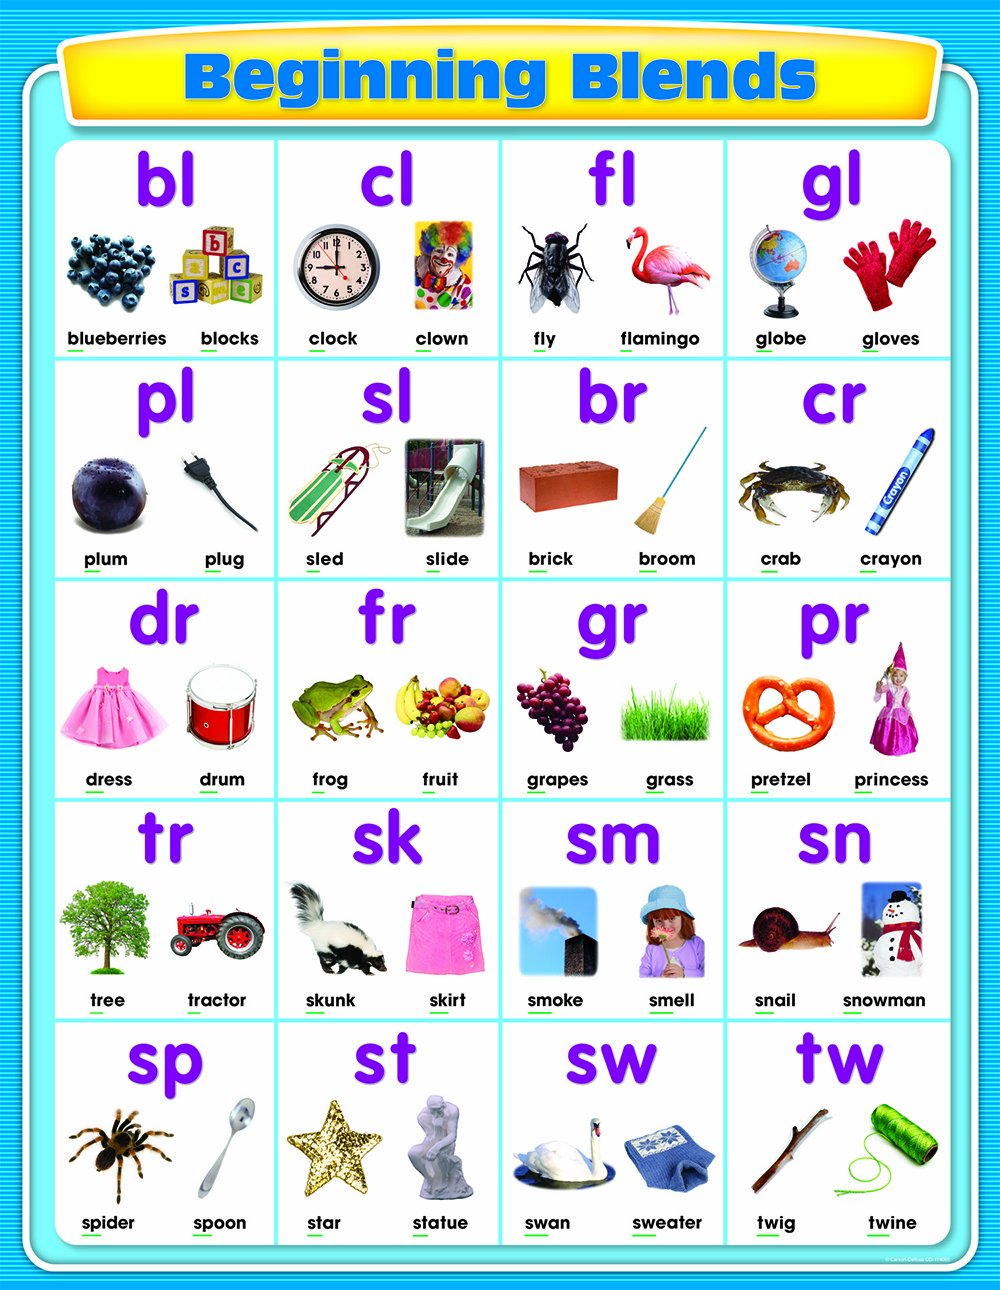 Worksheets Carson-dellosa Worksheets beginning blends chart amazon co uk carson dellosa publishing books